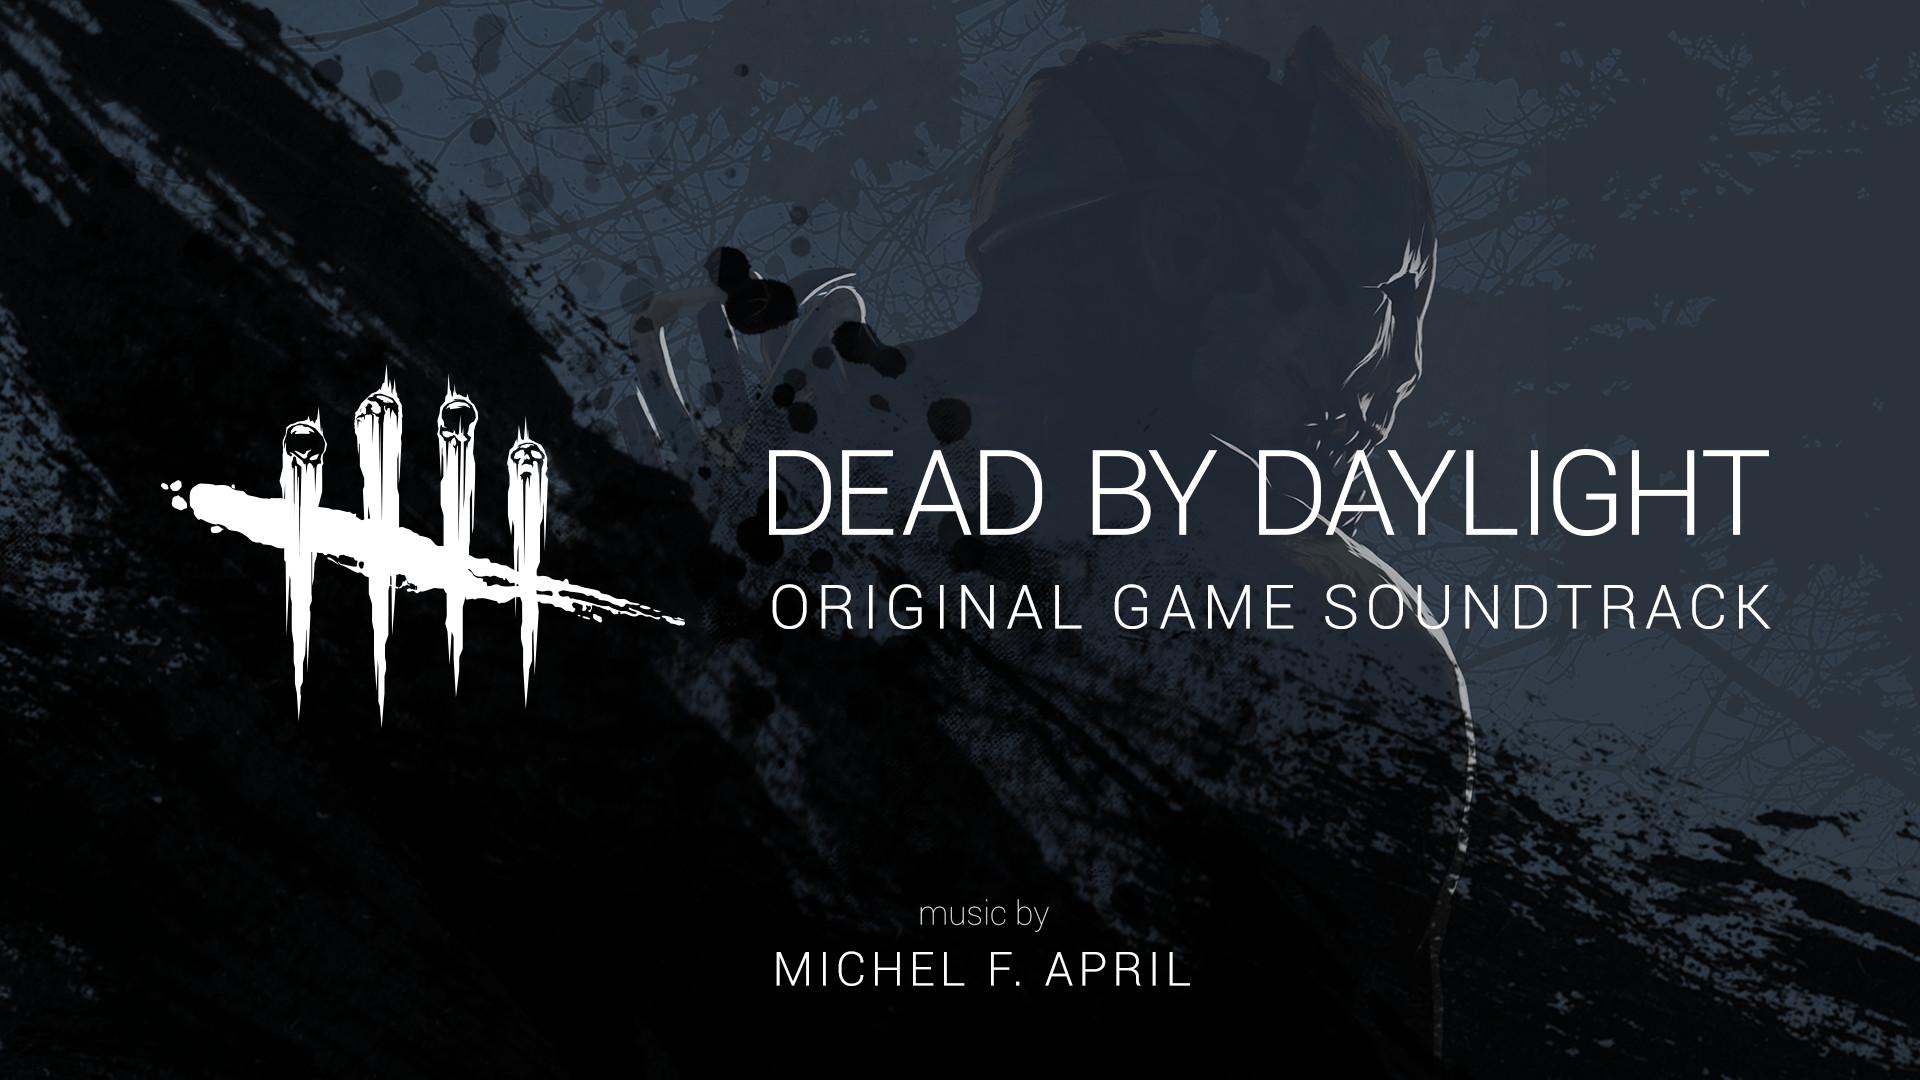 KHAiHOM.com - Dead by Daylight: Original Soundtrack